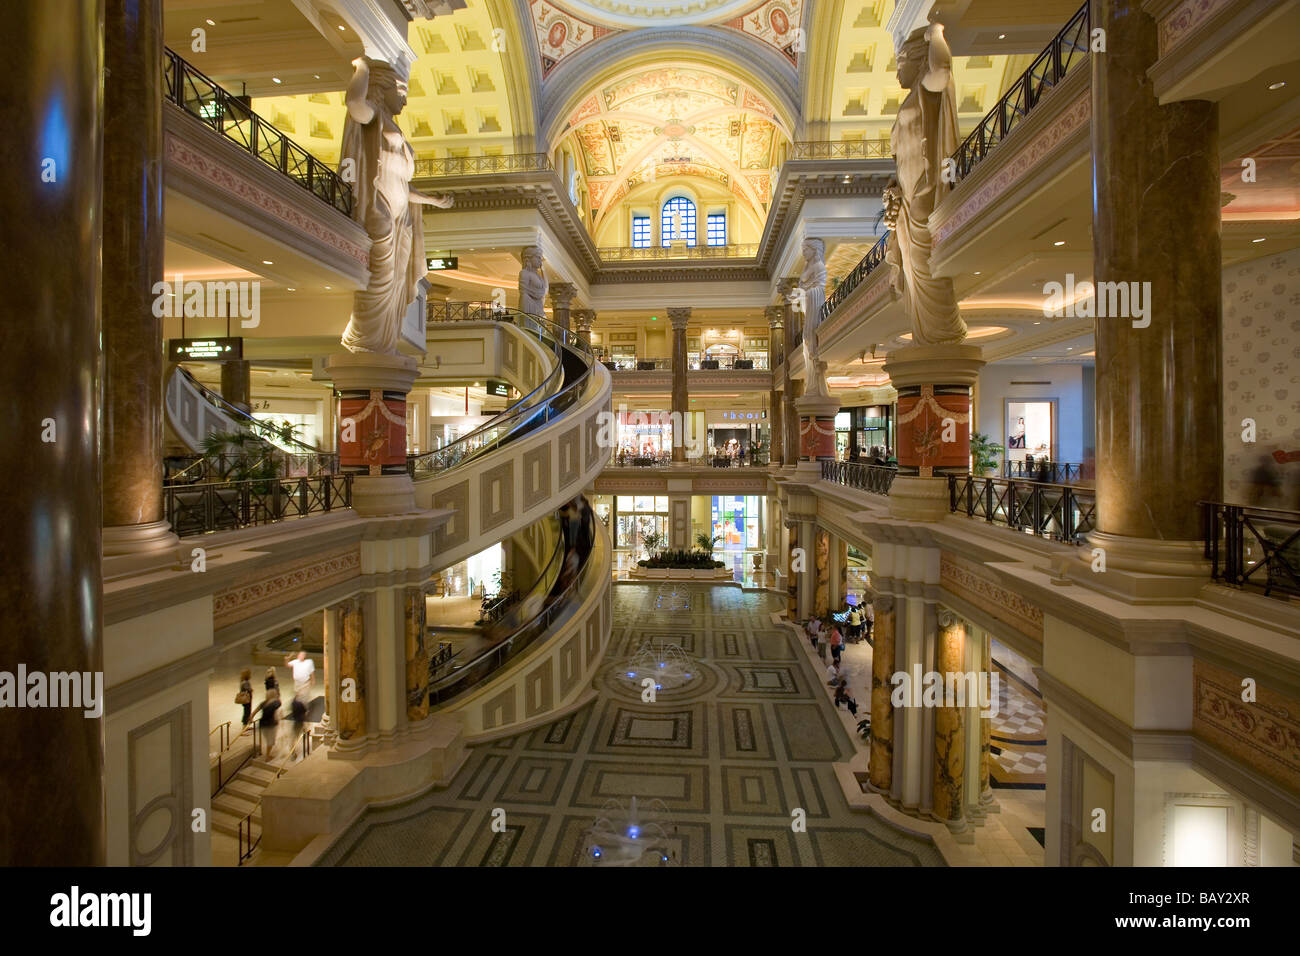 The Forum Shops at Caesars Palace in Las Vegas, Las Vegas, Nevada, USA Stock Photo